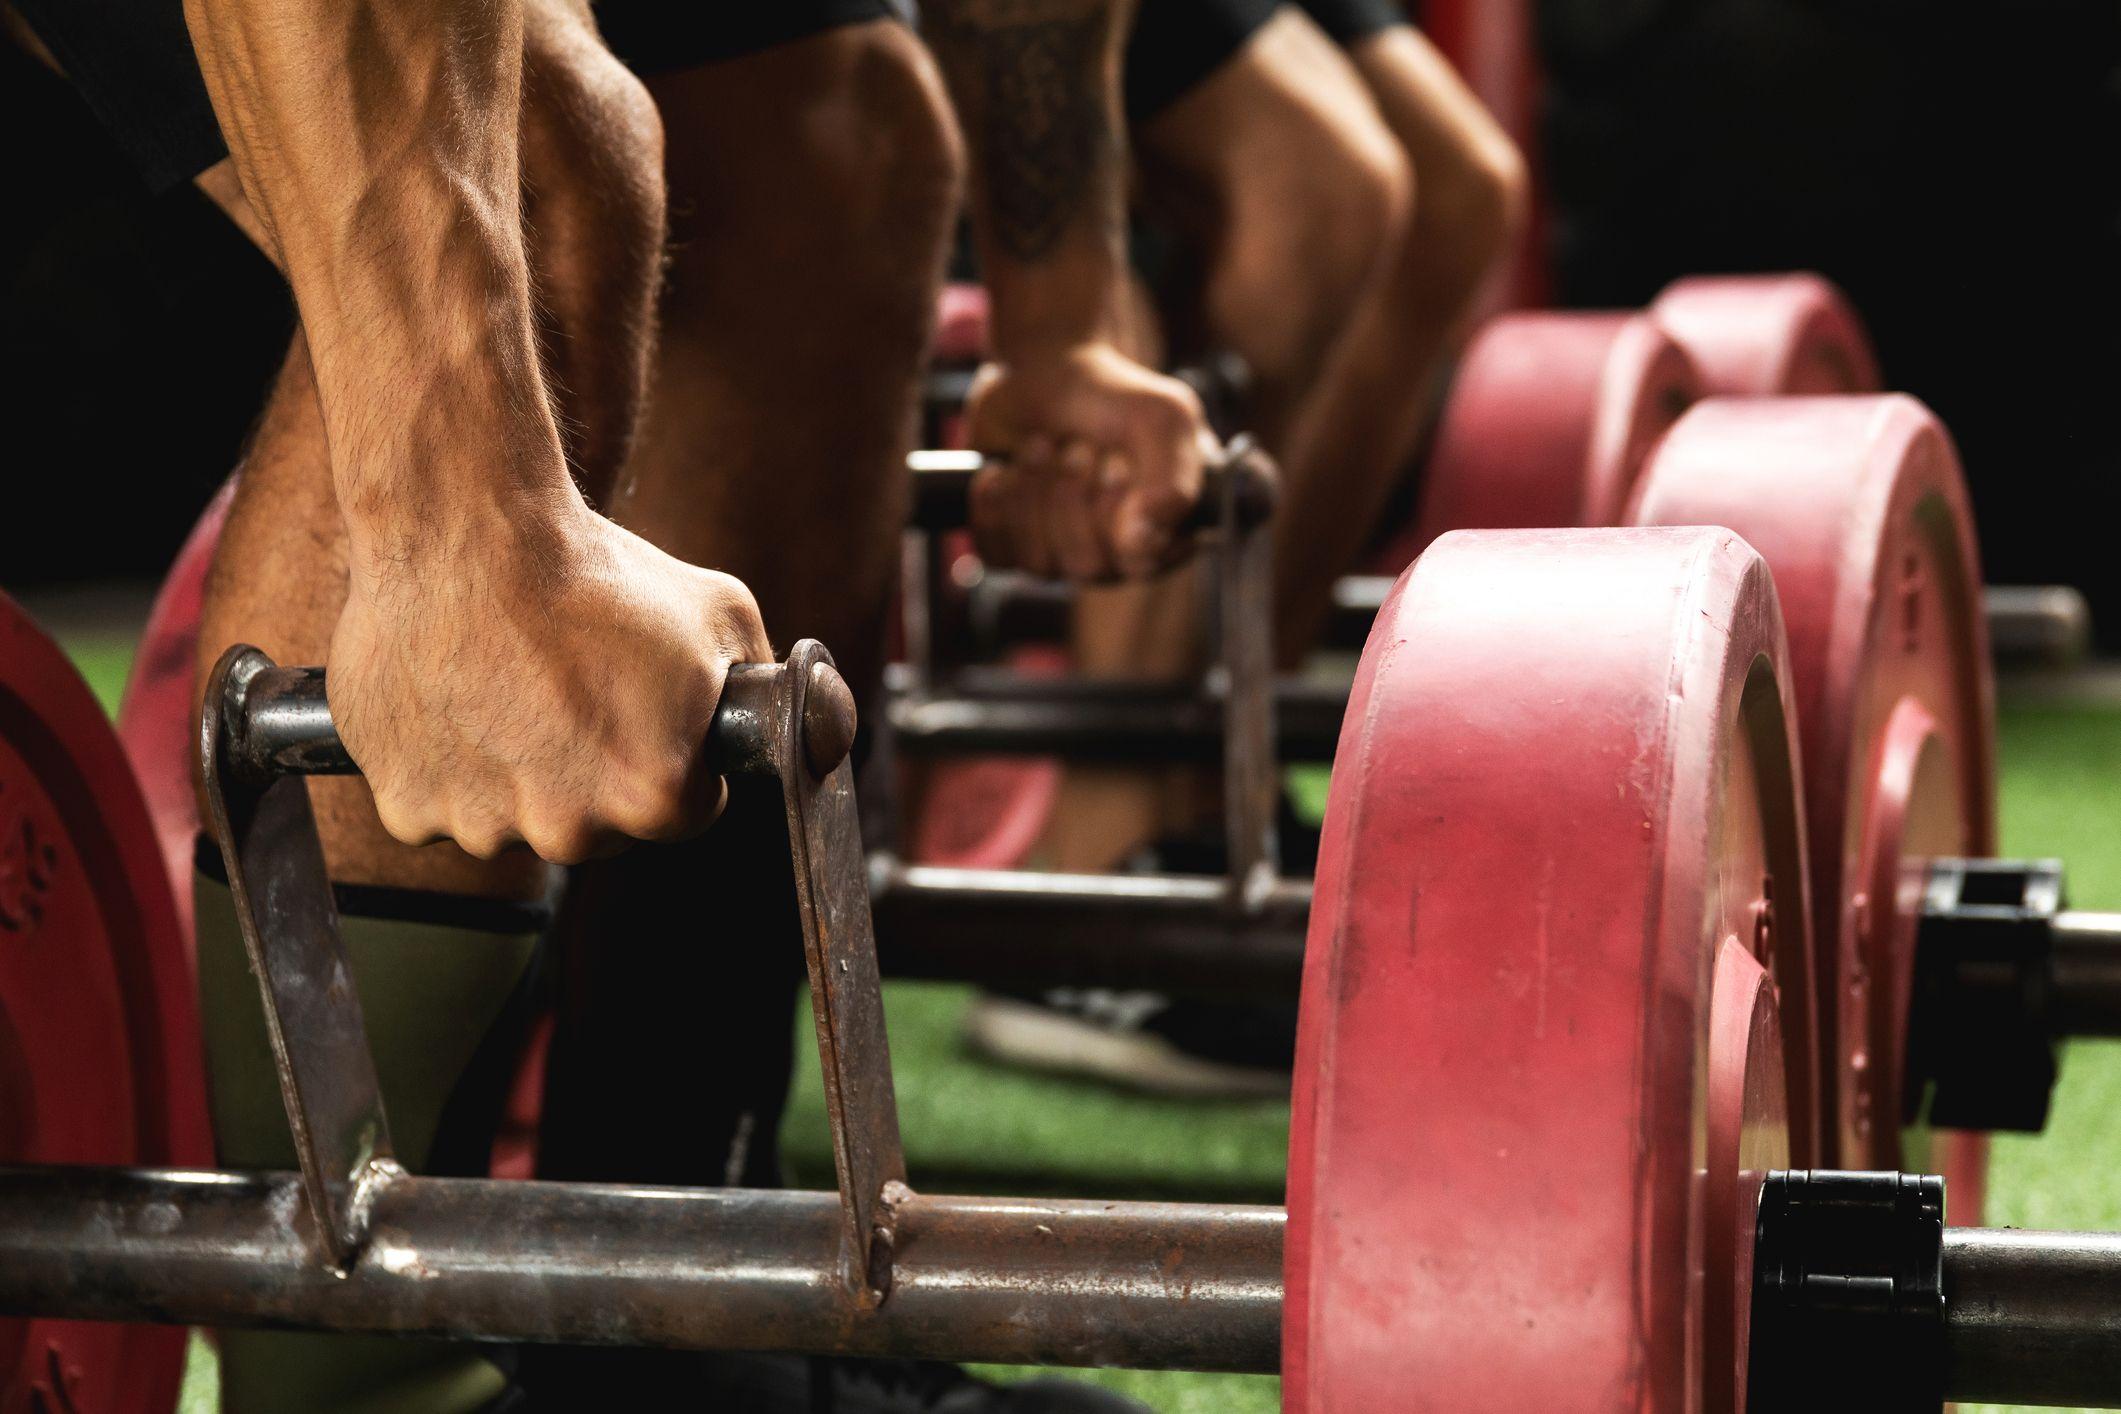 7 Grip Strength Training Tips for Stronger Forearms